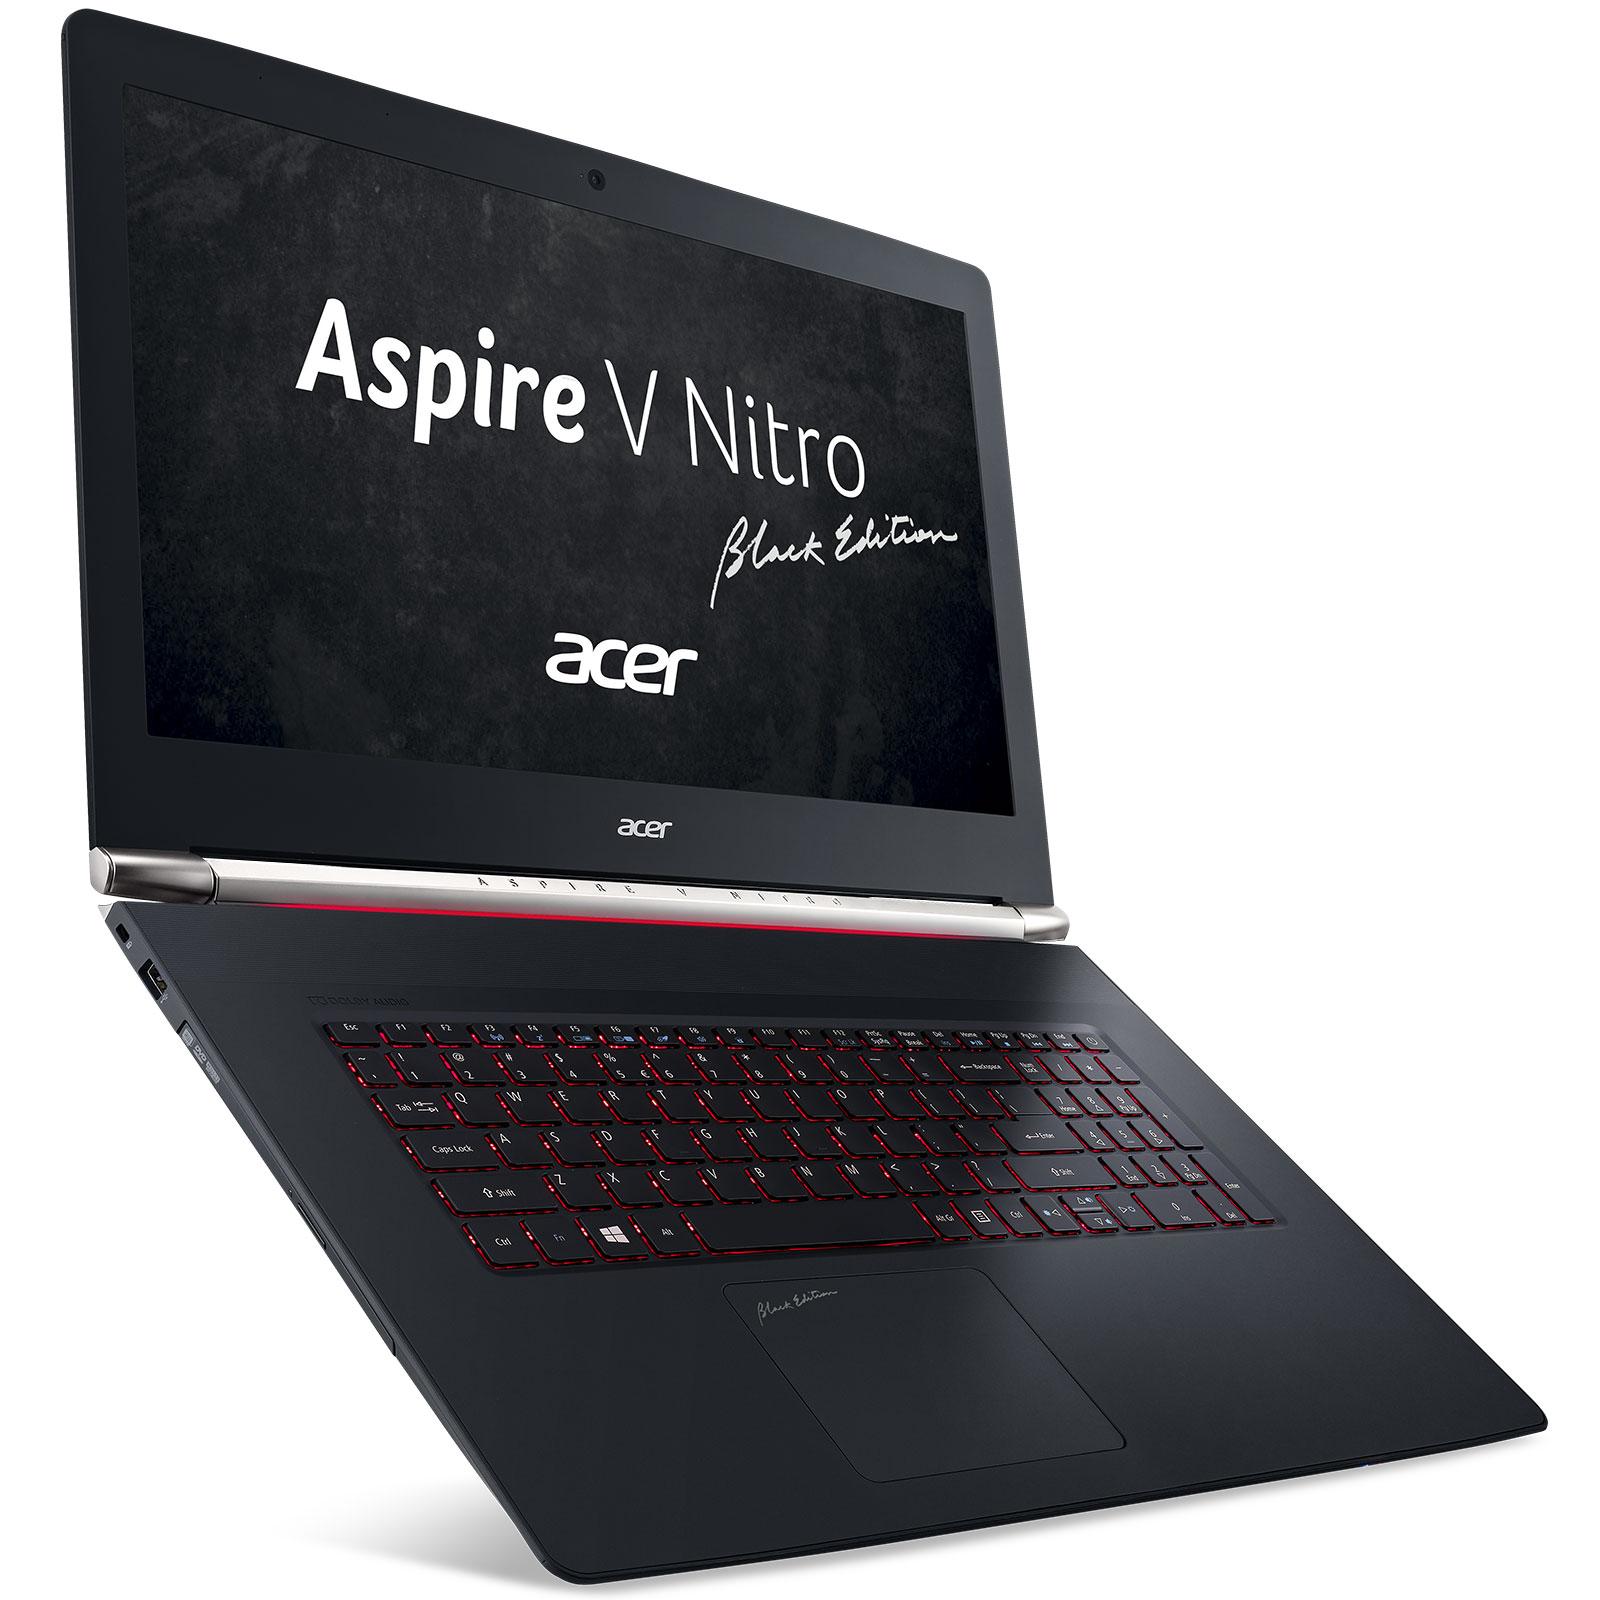 "PC portable Acer Aspire V Nitro VN7-792G-78CC Black Edition Intel Core i7-6700HQ 8 Go SSD 128 Go + HDD 1 To 17.3"" LED Full HD NVIDIA GeForce GTX 960M Wi-Fi AC/Bluetooth Webcam Windows 10 Famille 64 bits"